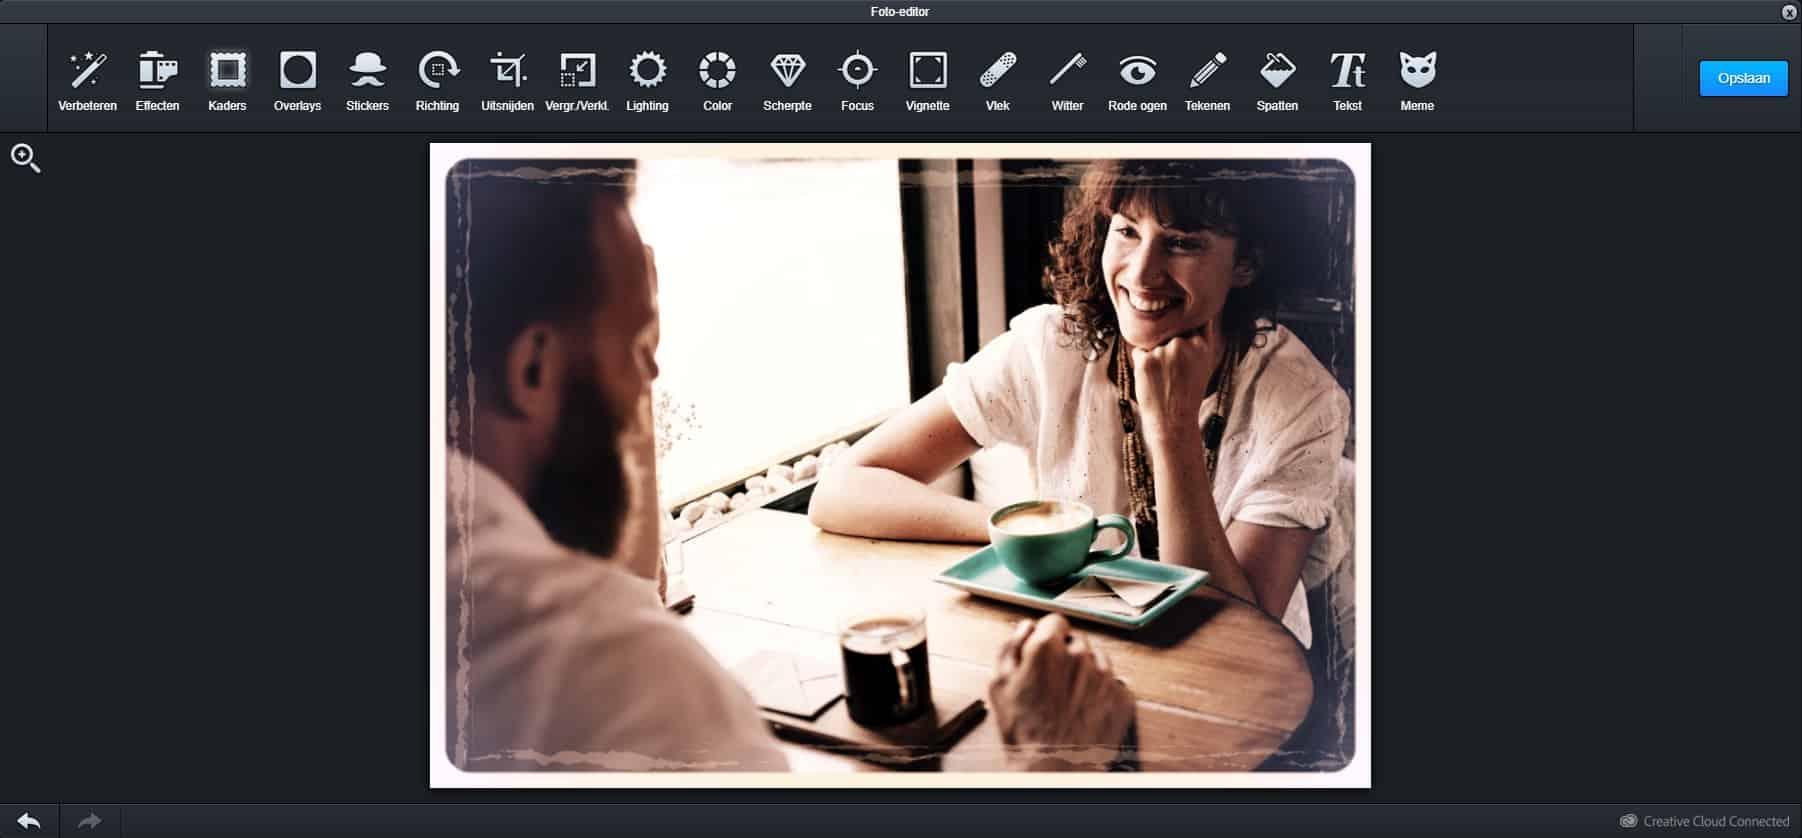 Adobe afbeeldingen editor